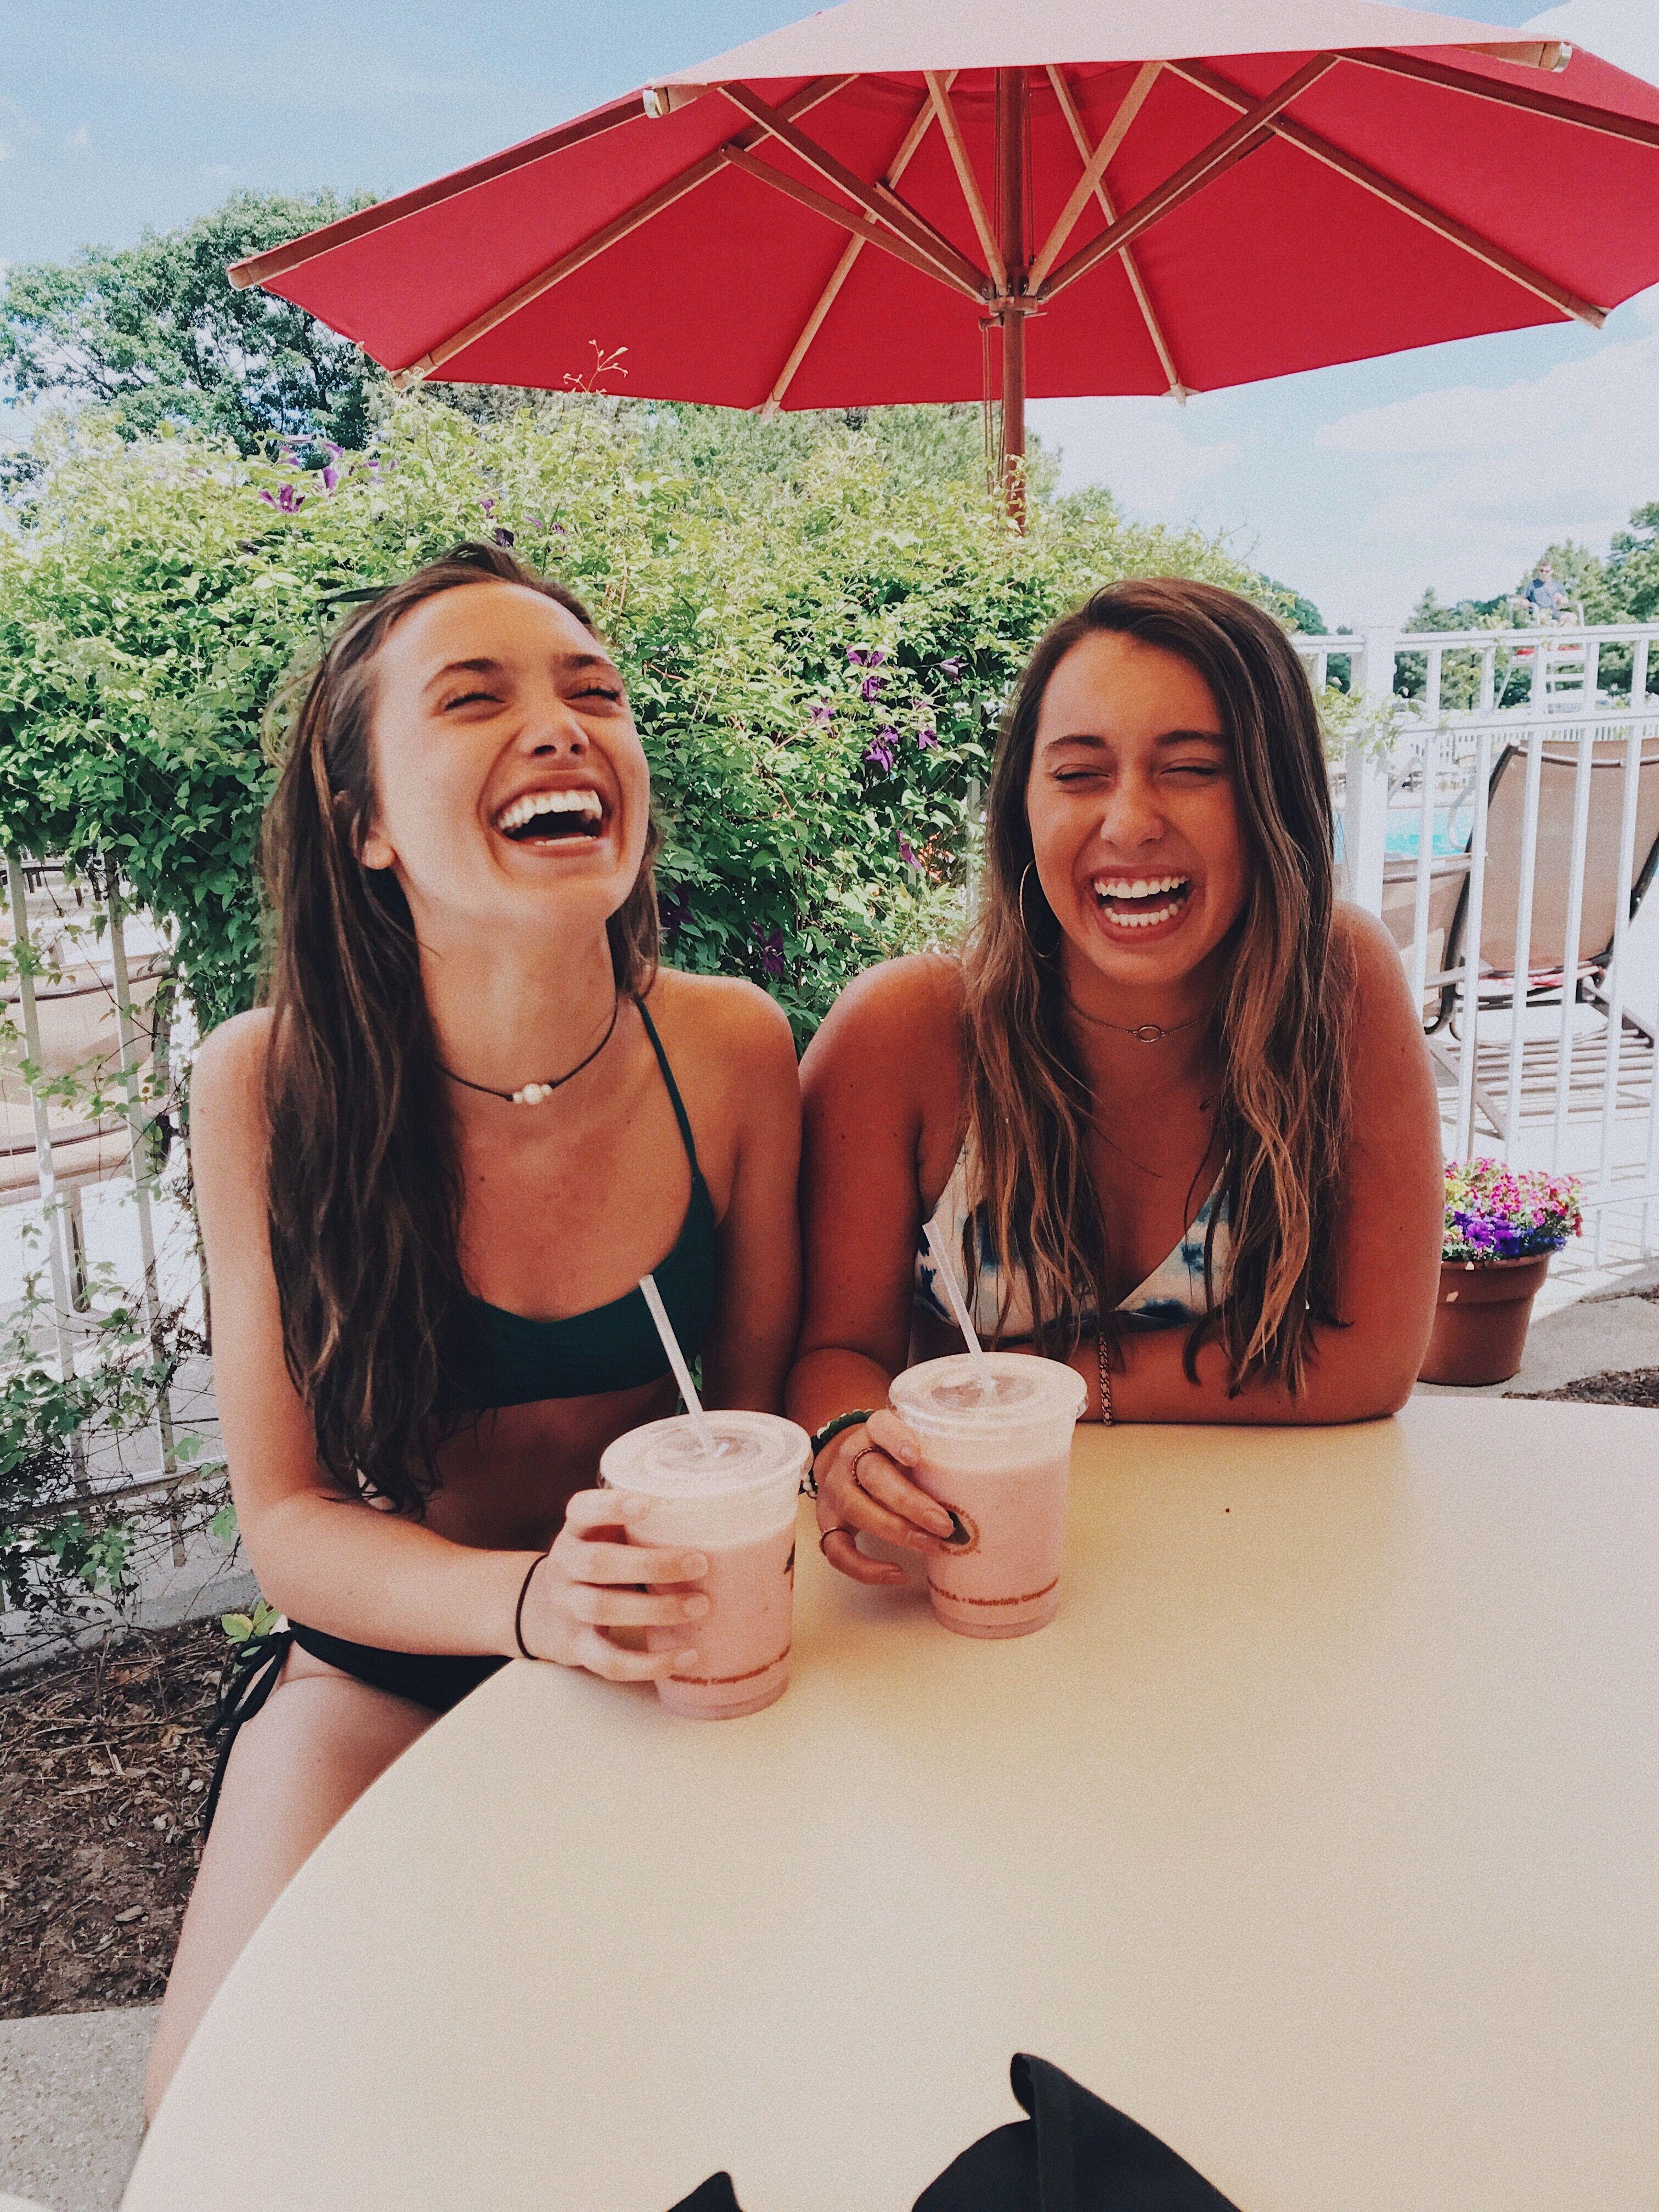 Instagram Pinterest Skyyamazin: All Laughs This Summer (my Pic) Instagram: Hannah_meloche